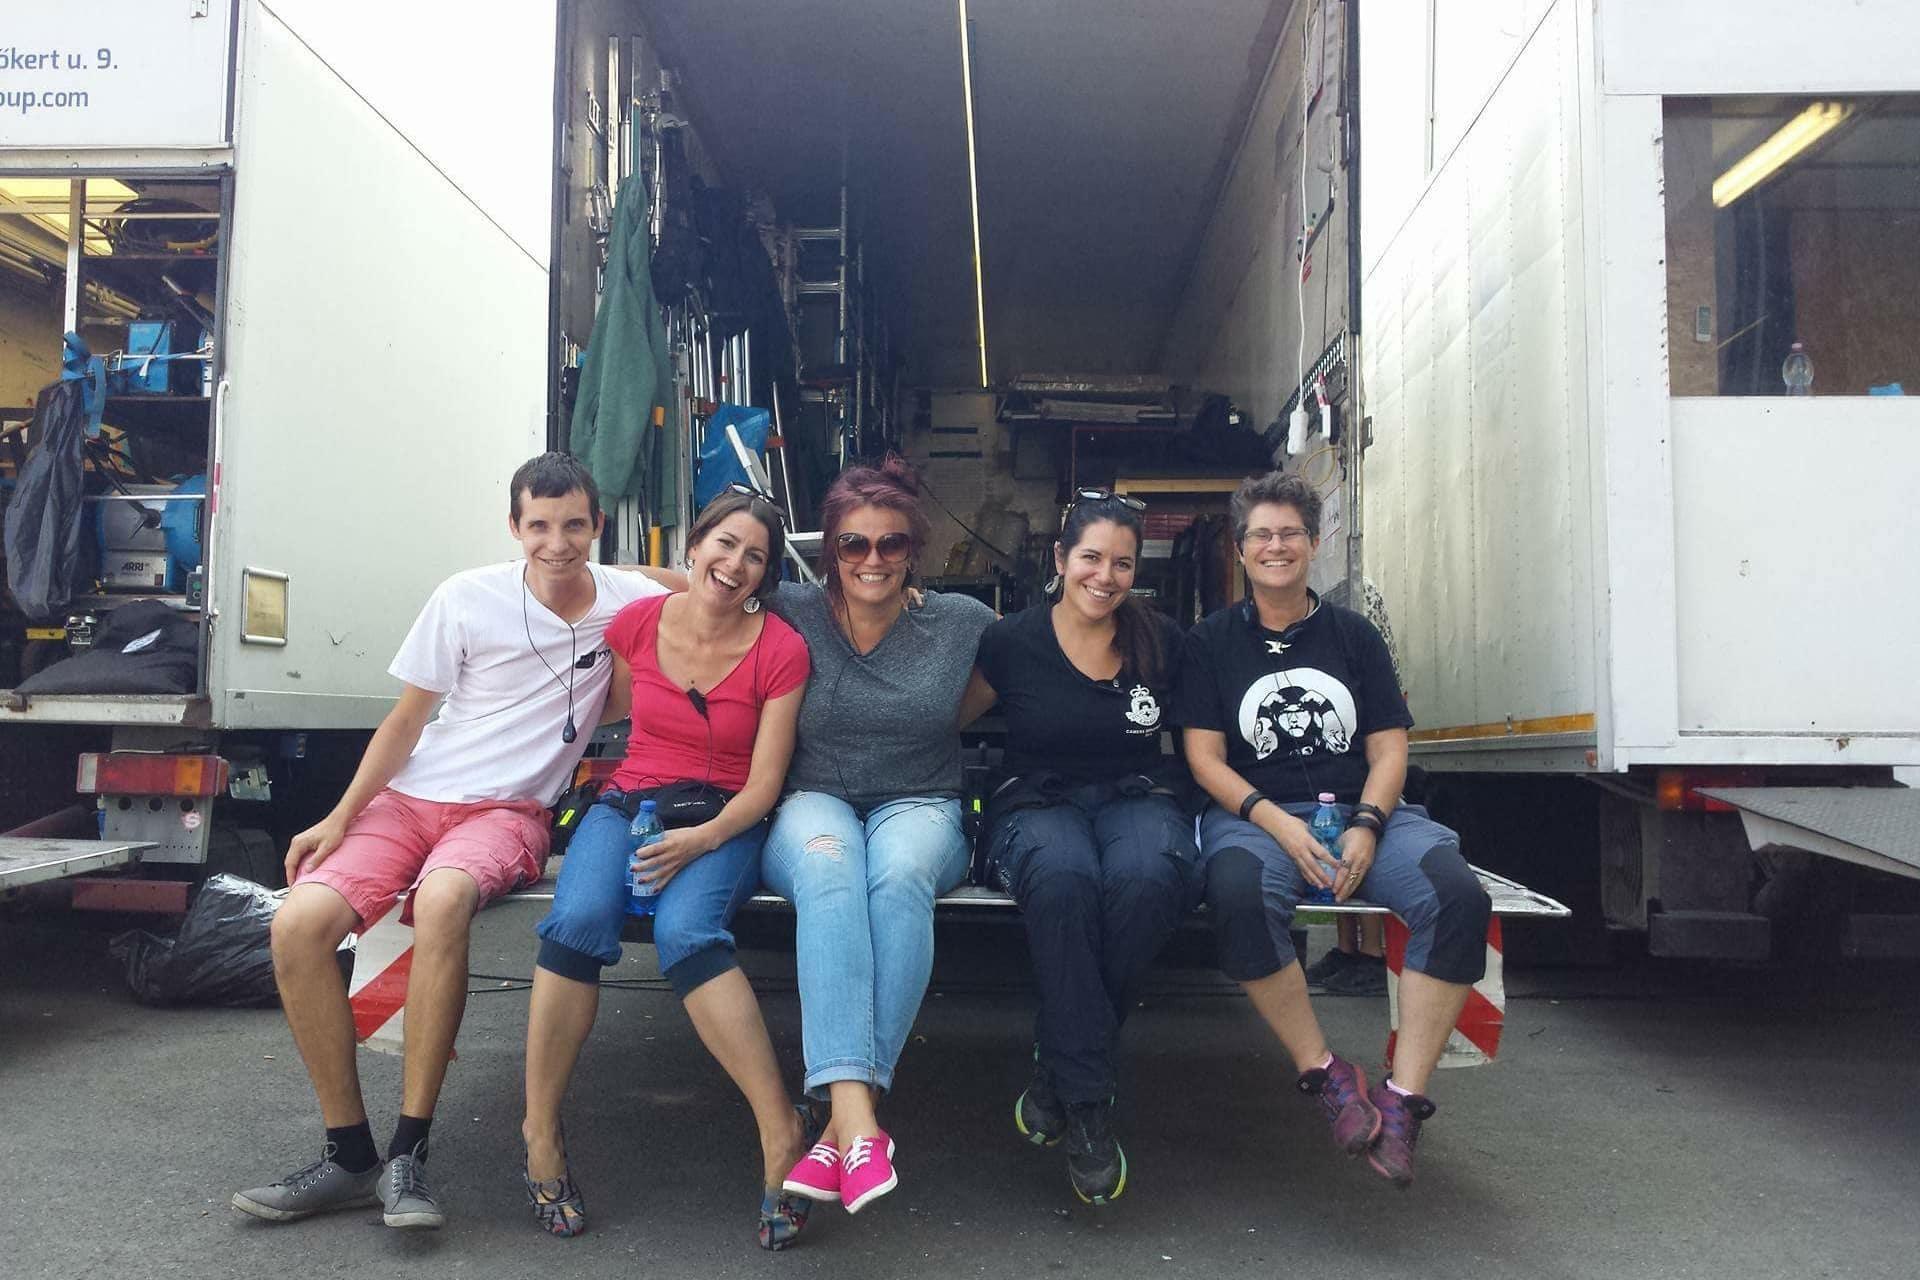 Behind the scenes on the set of X Company Season 3 with AD Team (L to R) Máté György, Réka Kovács, Dominika Jurek, Emese Matuz and Sorcha Vasey.